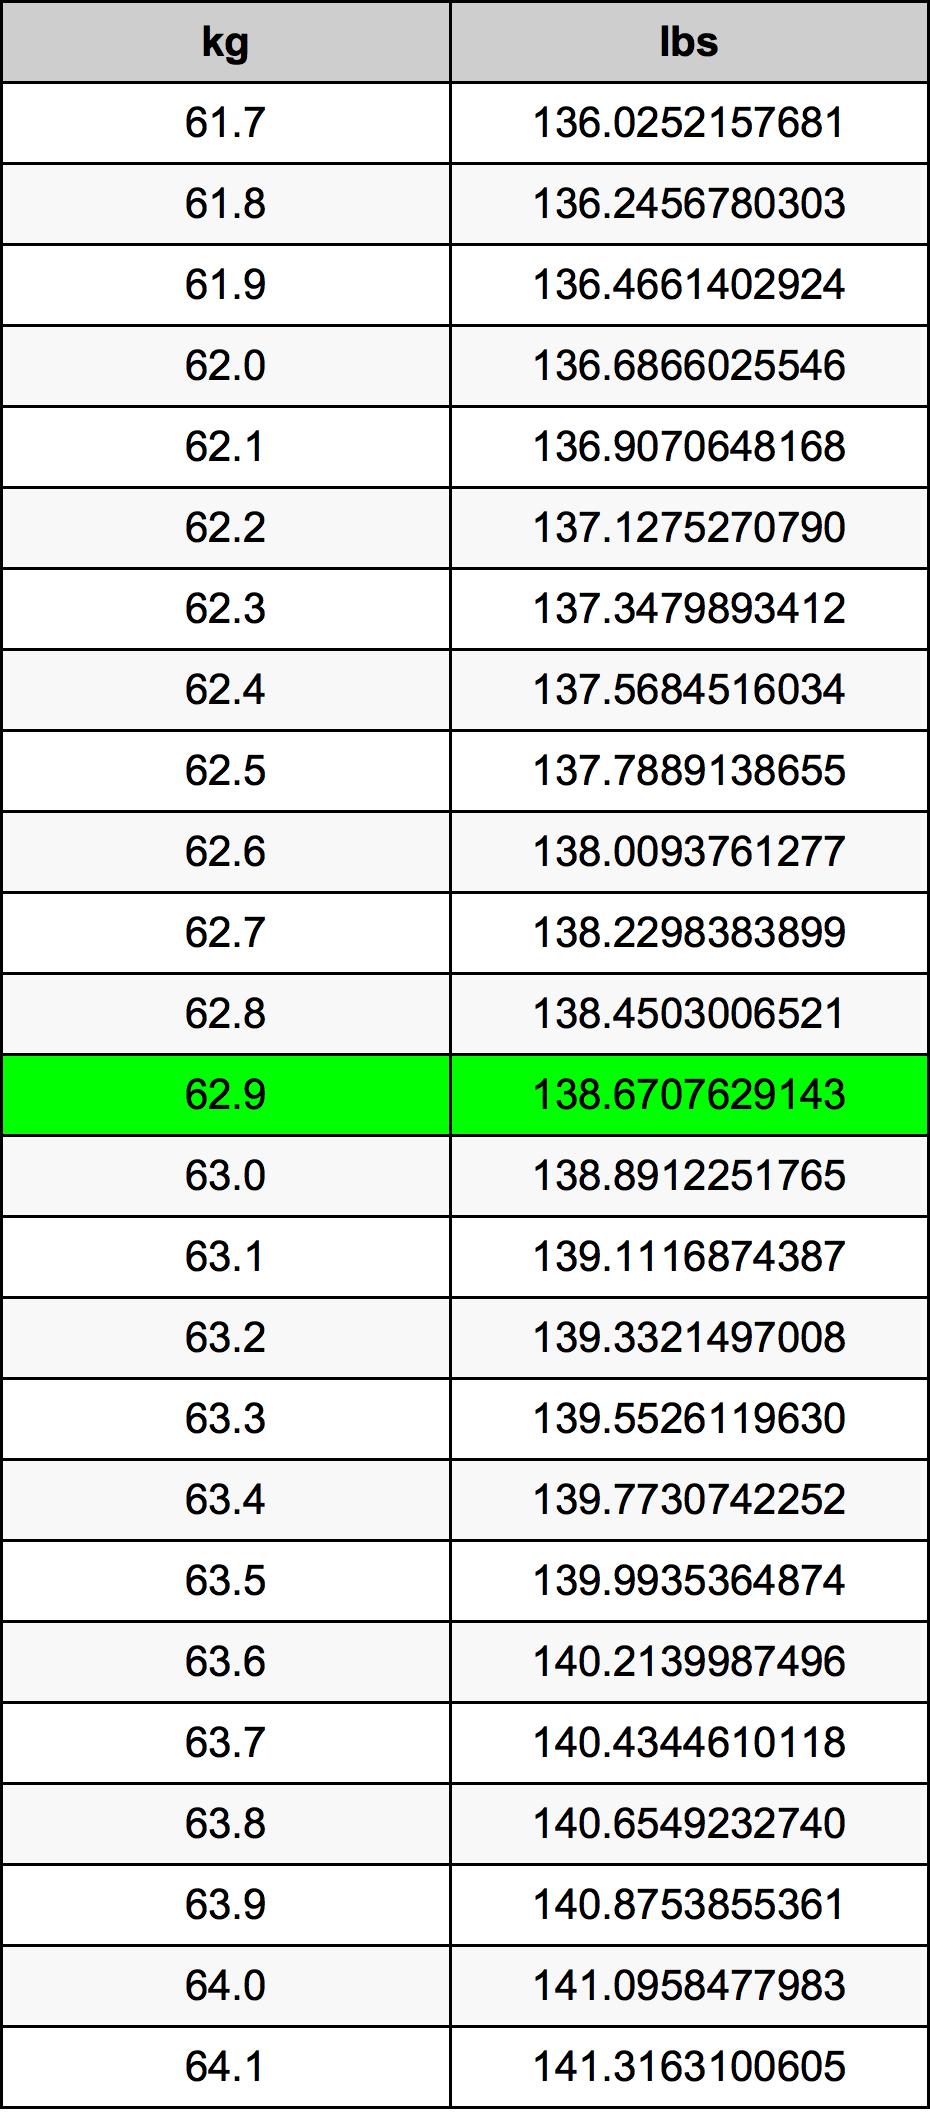 62.9 Kilogramma konverżjoni tabella